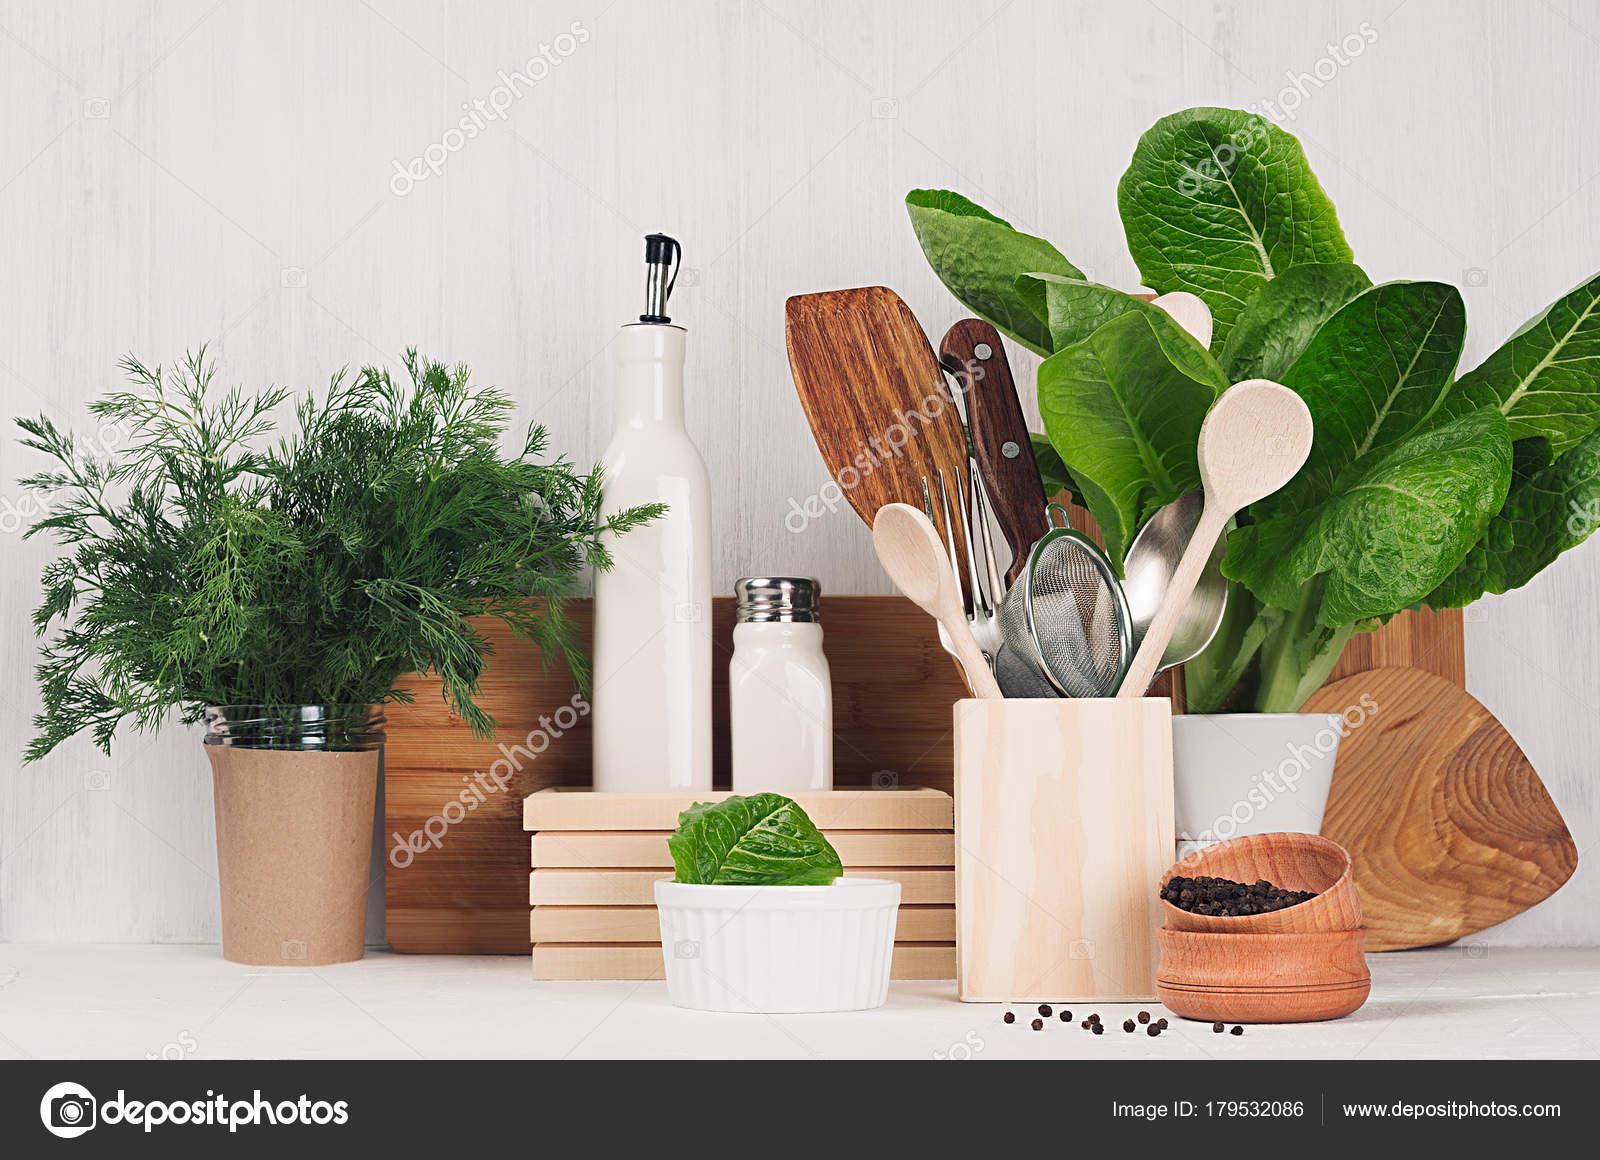 Utensili Cucina Legno Beige Marrone Naturale Piante Verdi Luce Legno ...